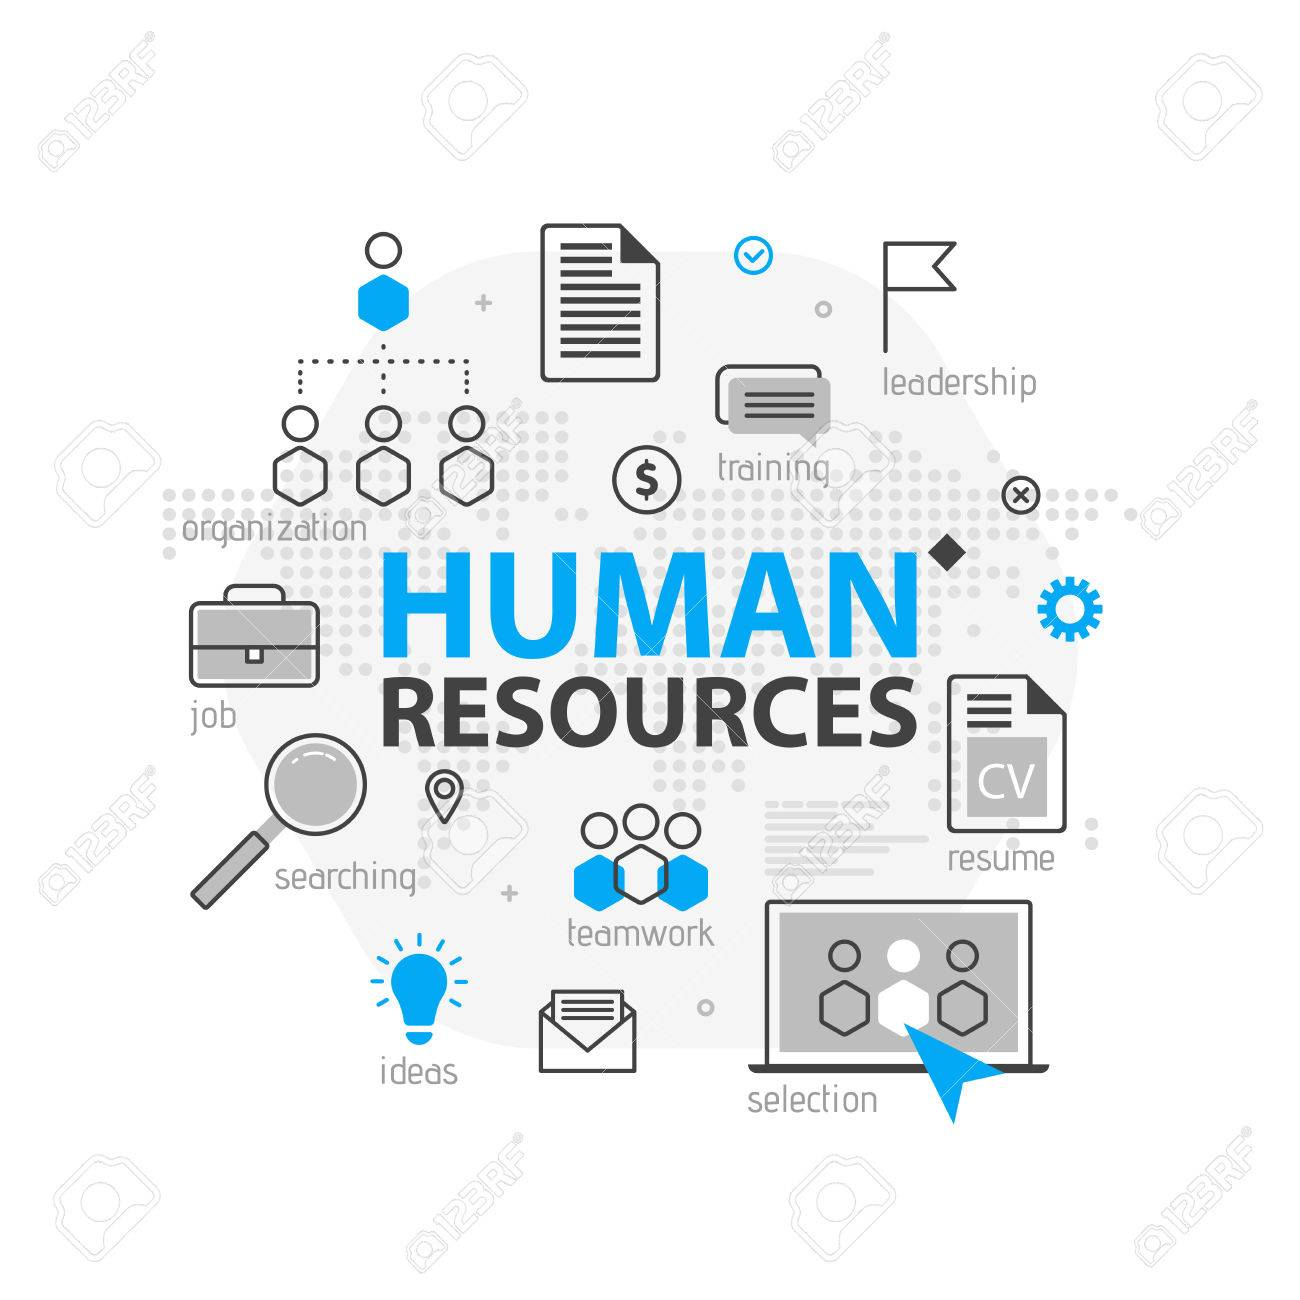 Human Resources Web Banner Concept Outline Line Business Icon - Unique outline template for presentation concept